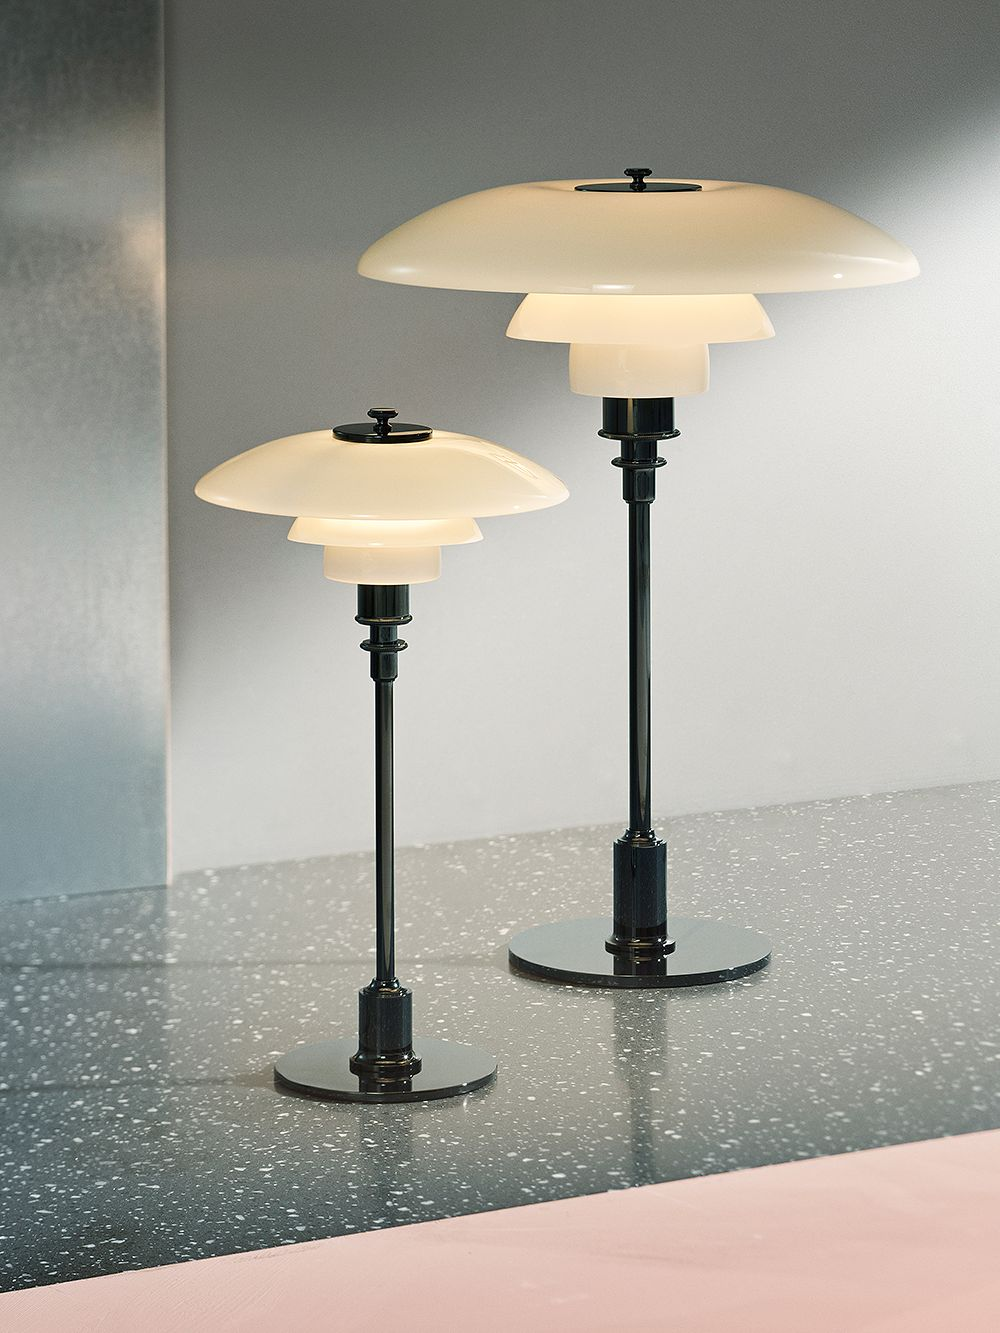 Louis Poulsen PH 3/2 table light